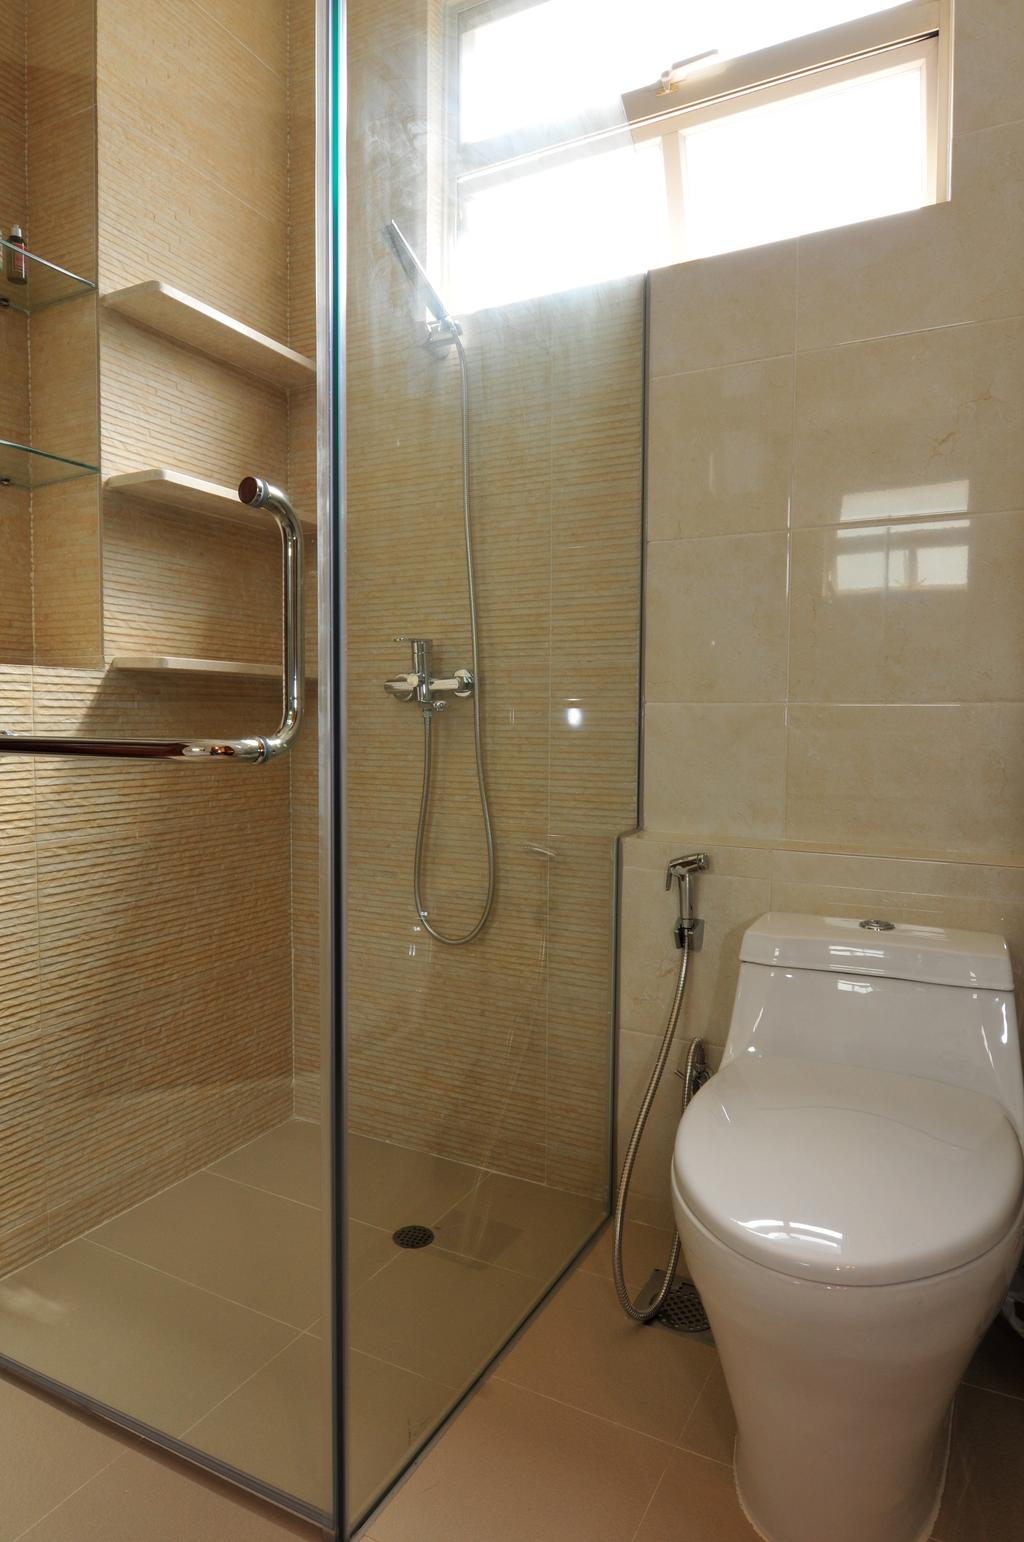 Transitional, Landed, Bathroom, Greenwood Avenue, Interior Designer, Seven Heaven, Indoors, Interior Design, Room